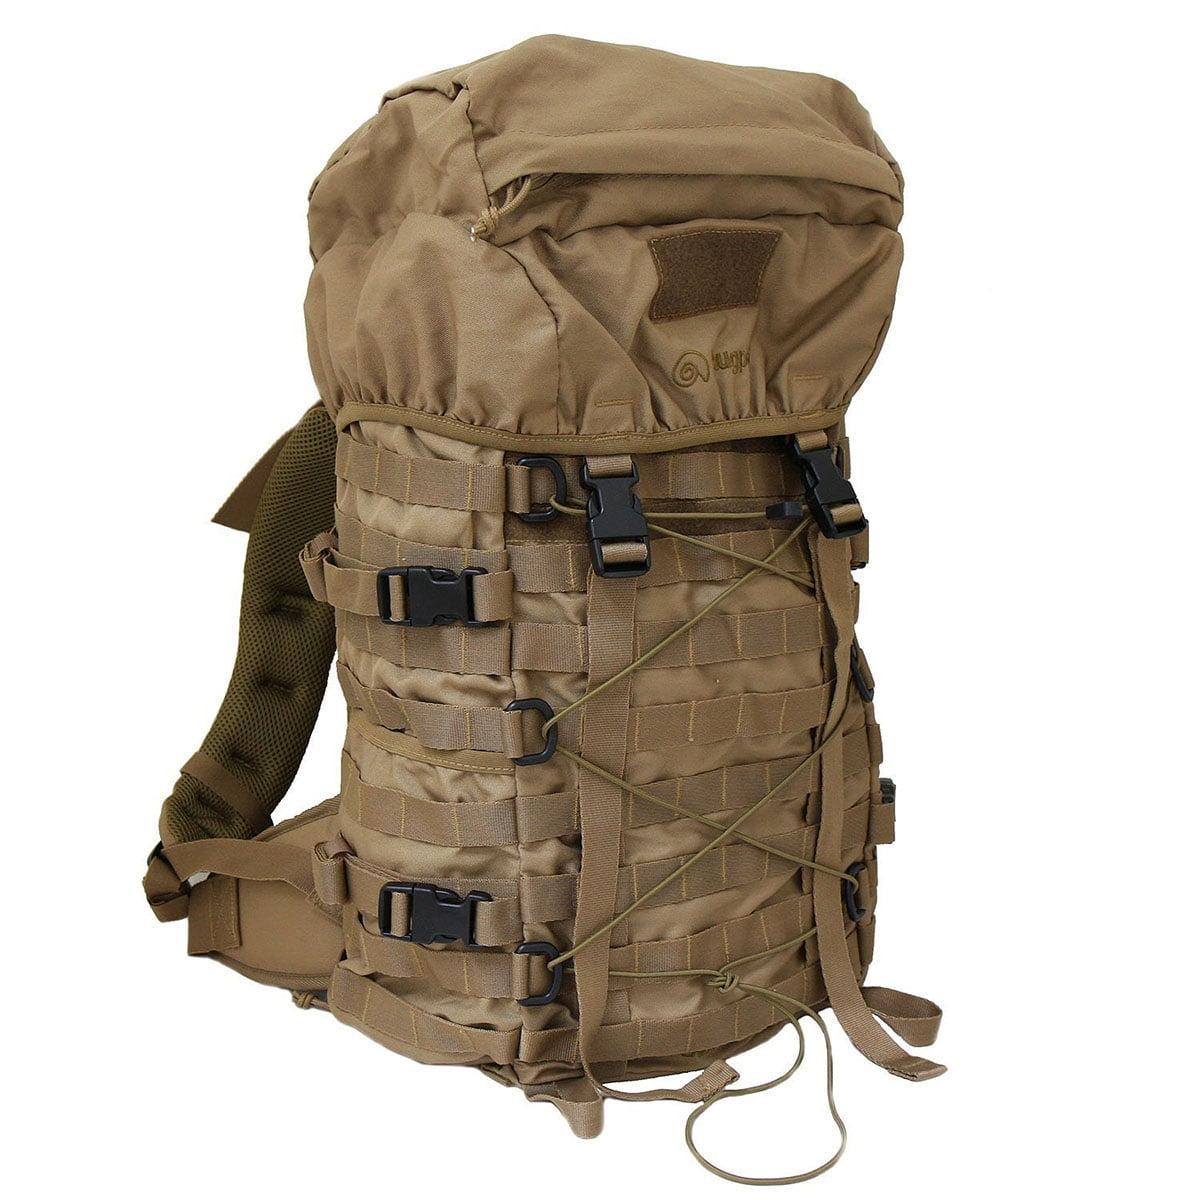 Snugpak  - Endurance 40 Backpack Coyote Tan - 92186